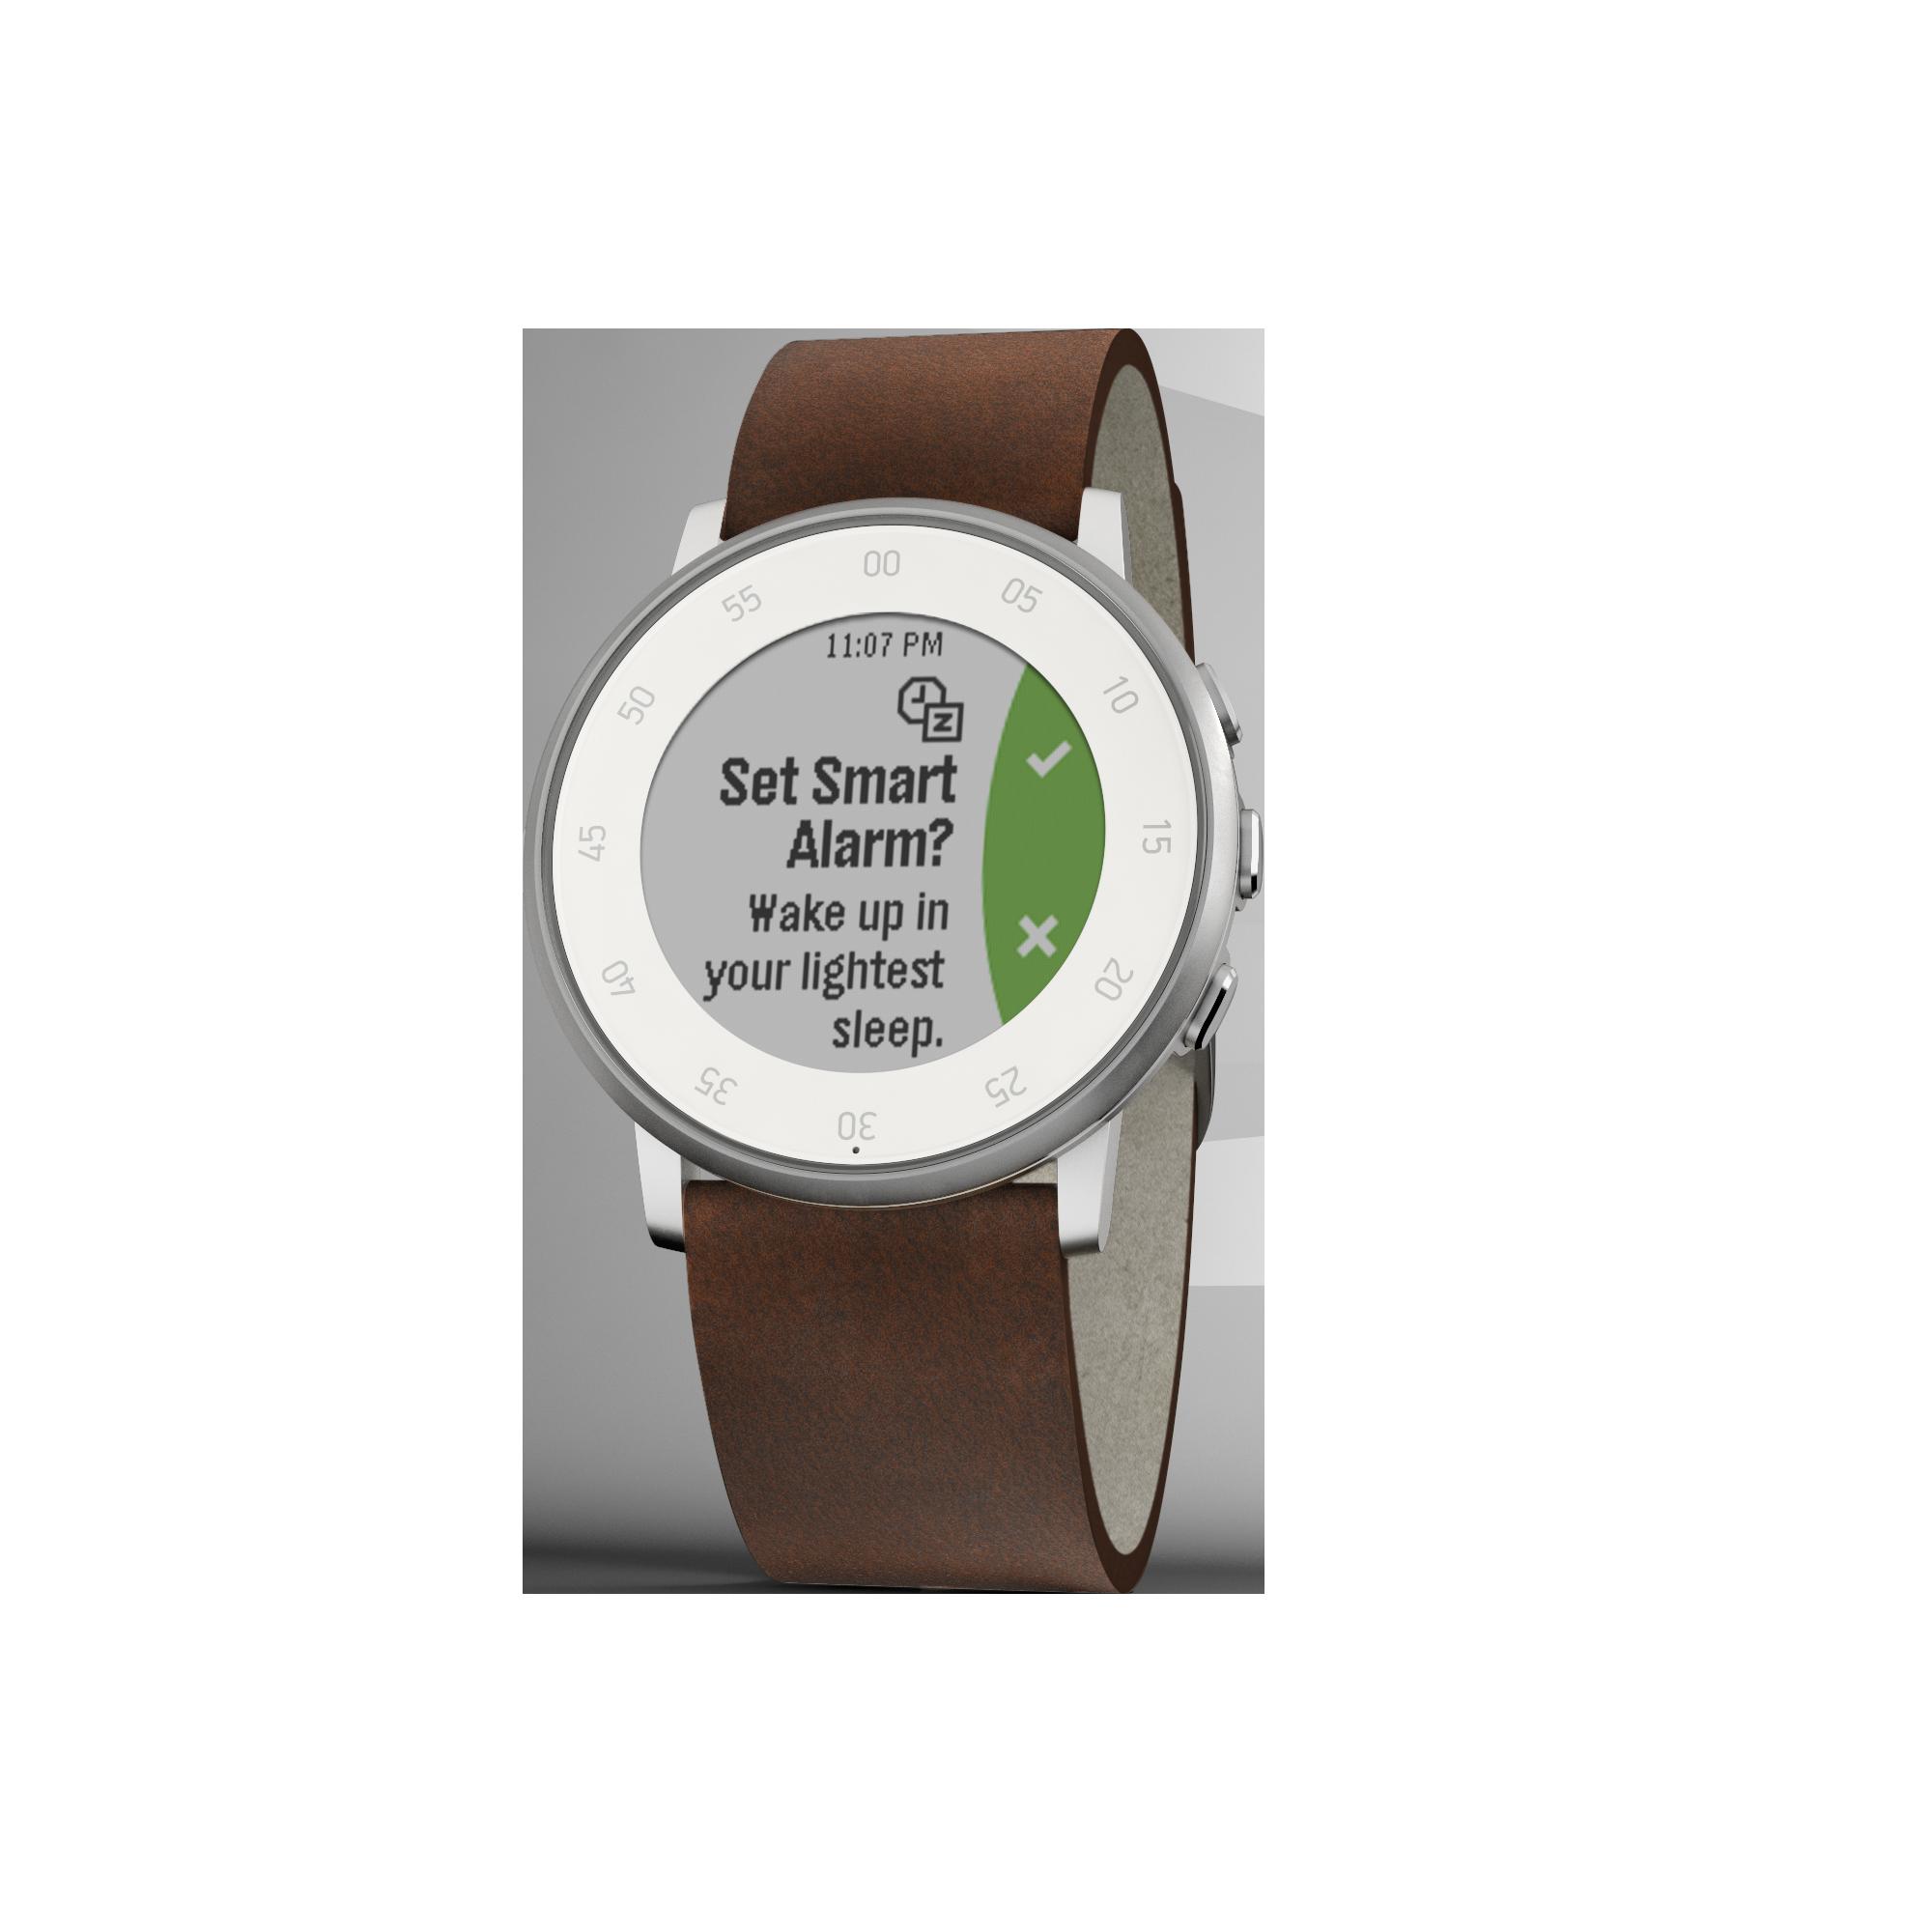 03 Smart Alarm PTR